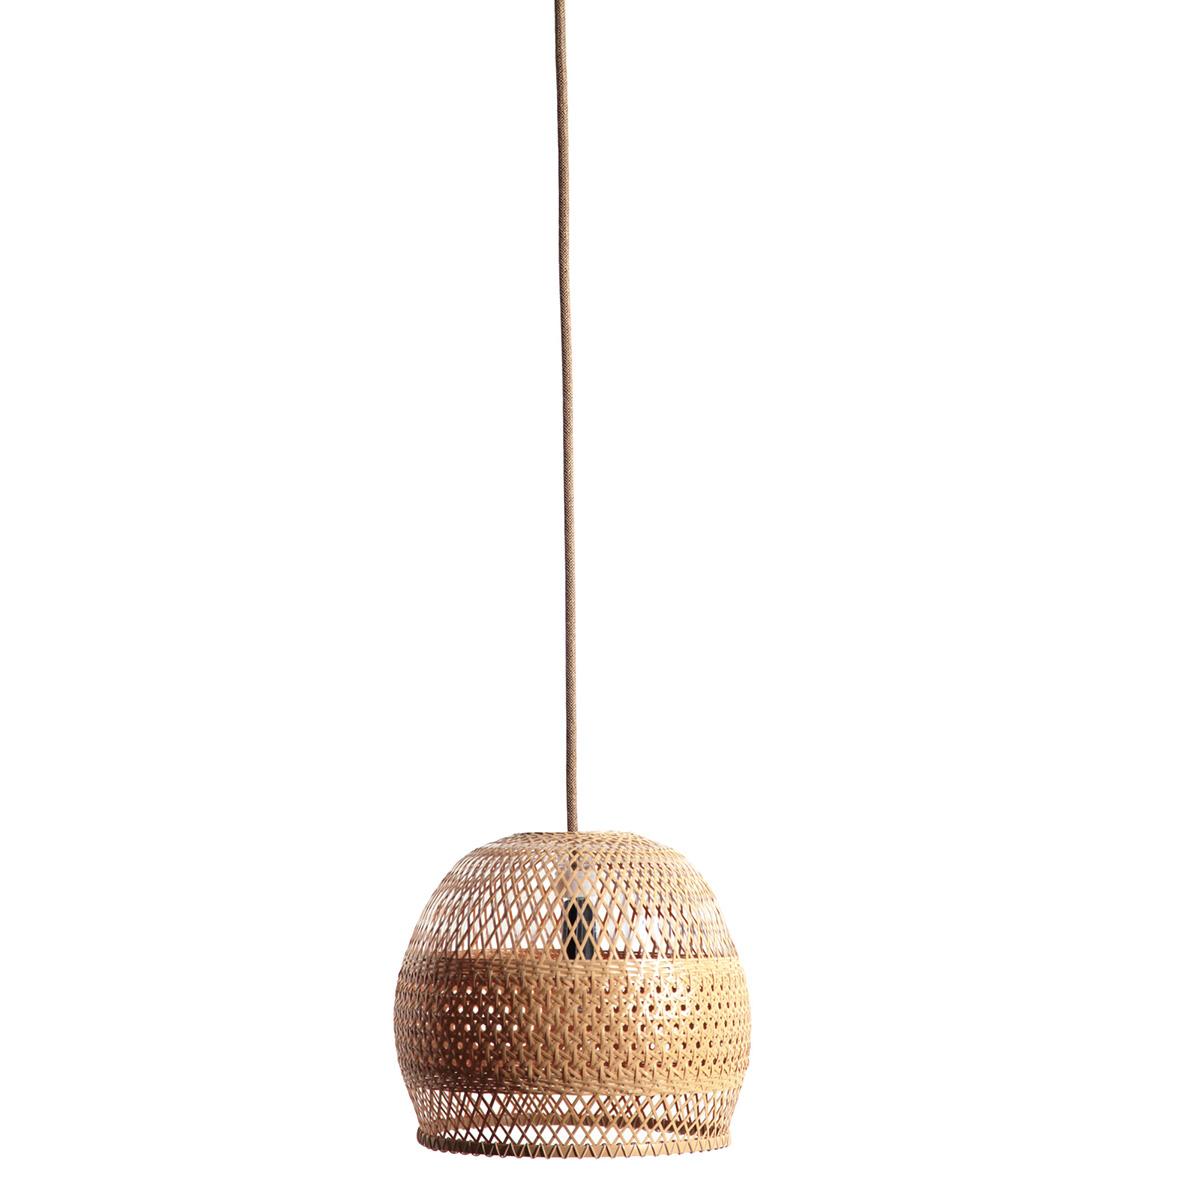 09-pet-lamp-kyoto-chiemi-ogura-alvaro-catalan-ocon